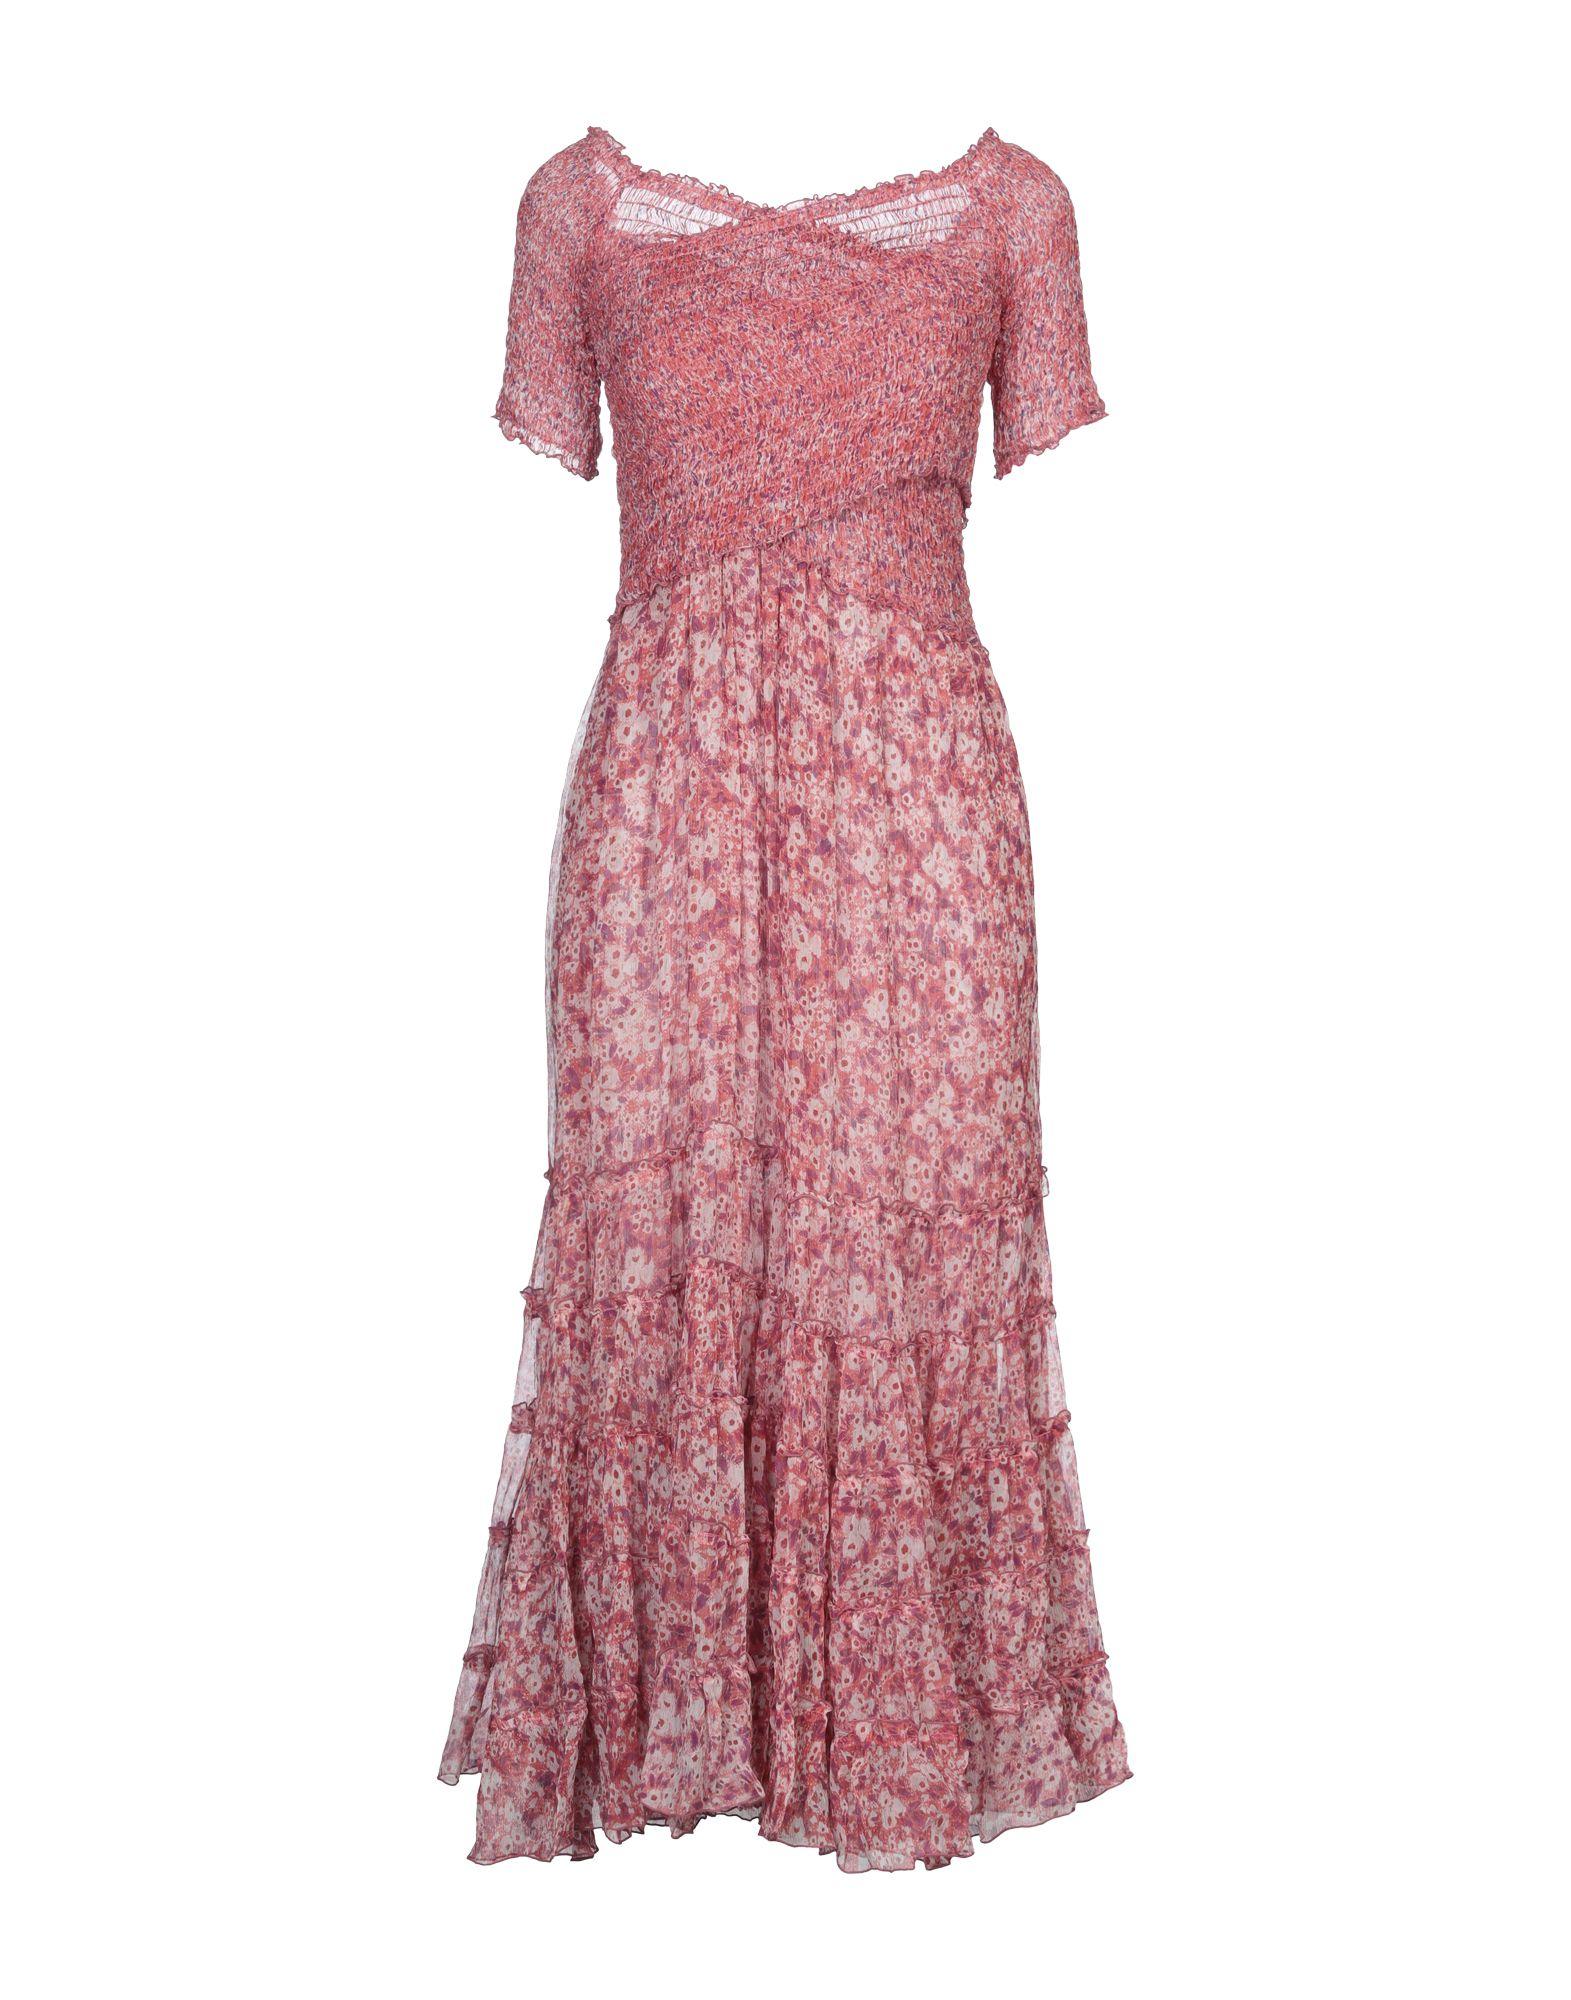 POUPETTE ST BARTH Платье длиной 3/4